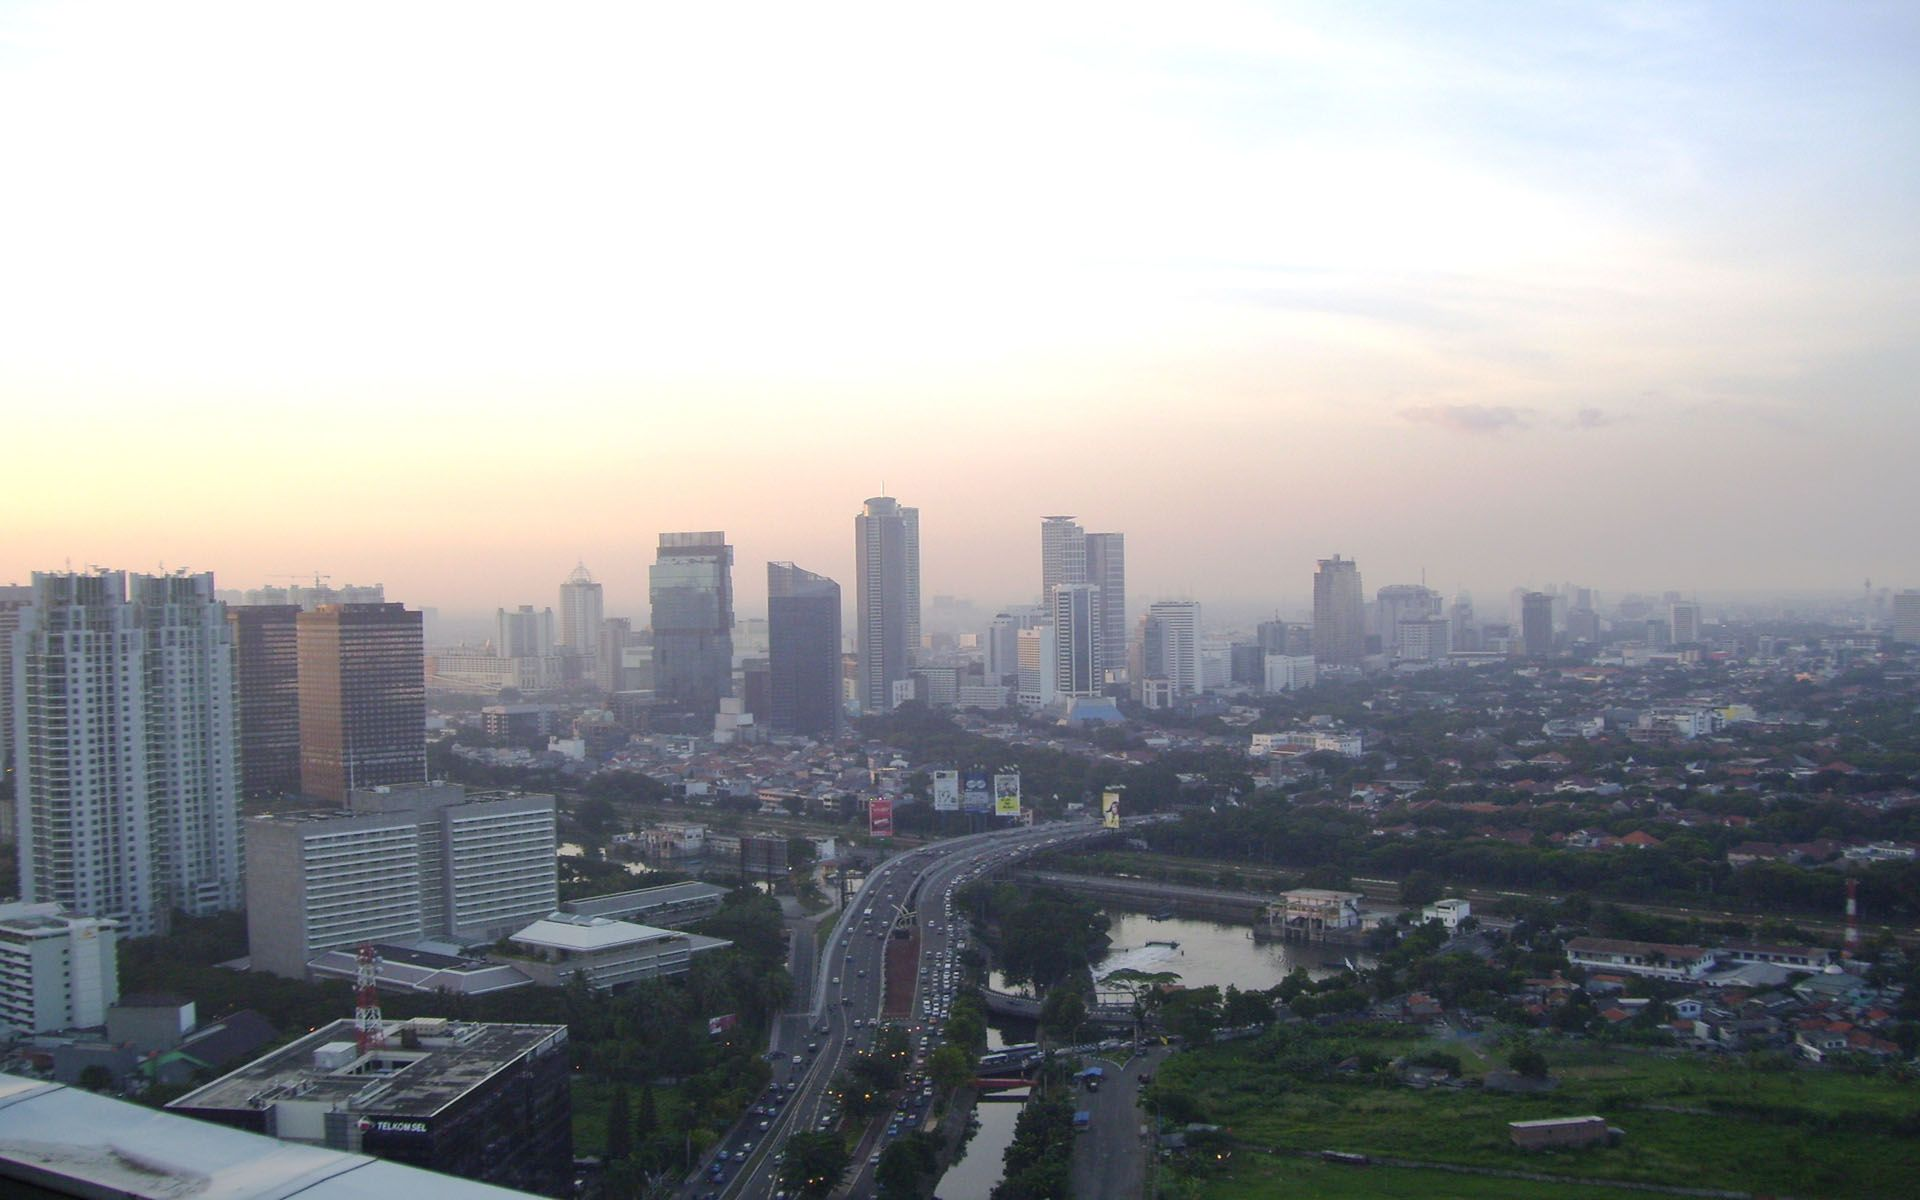 iPhone 7 - Man Made/Jakarta - Wallpaper ID: 597860